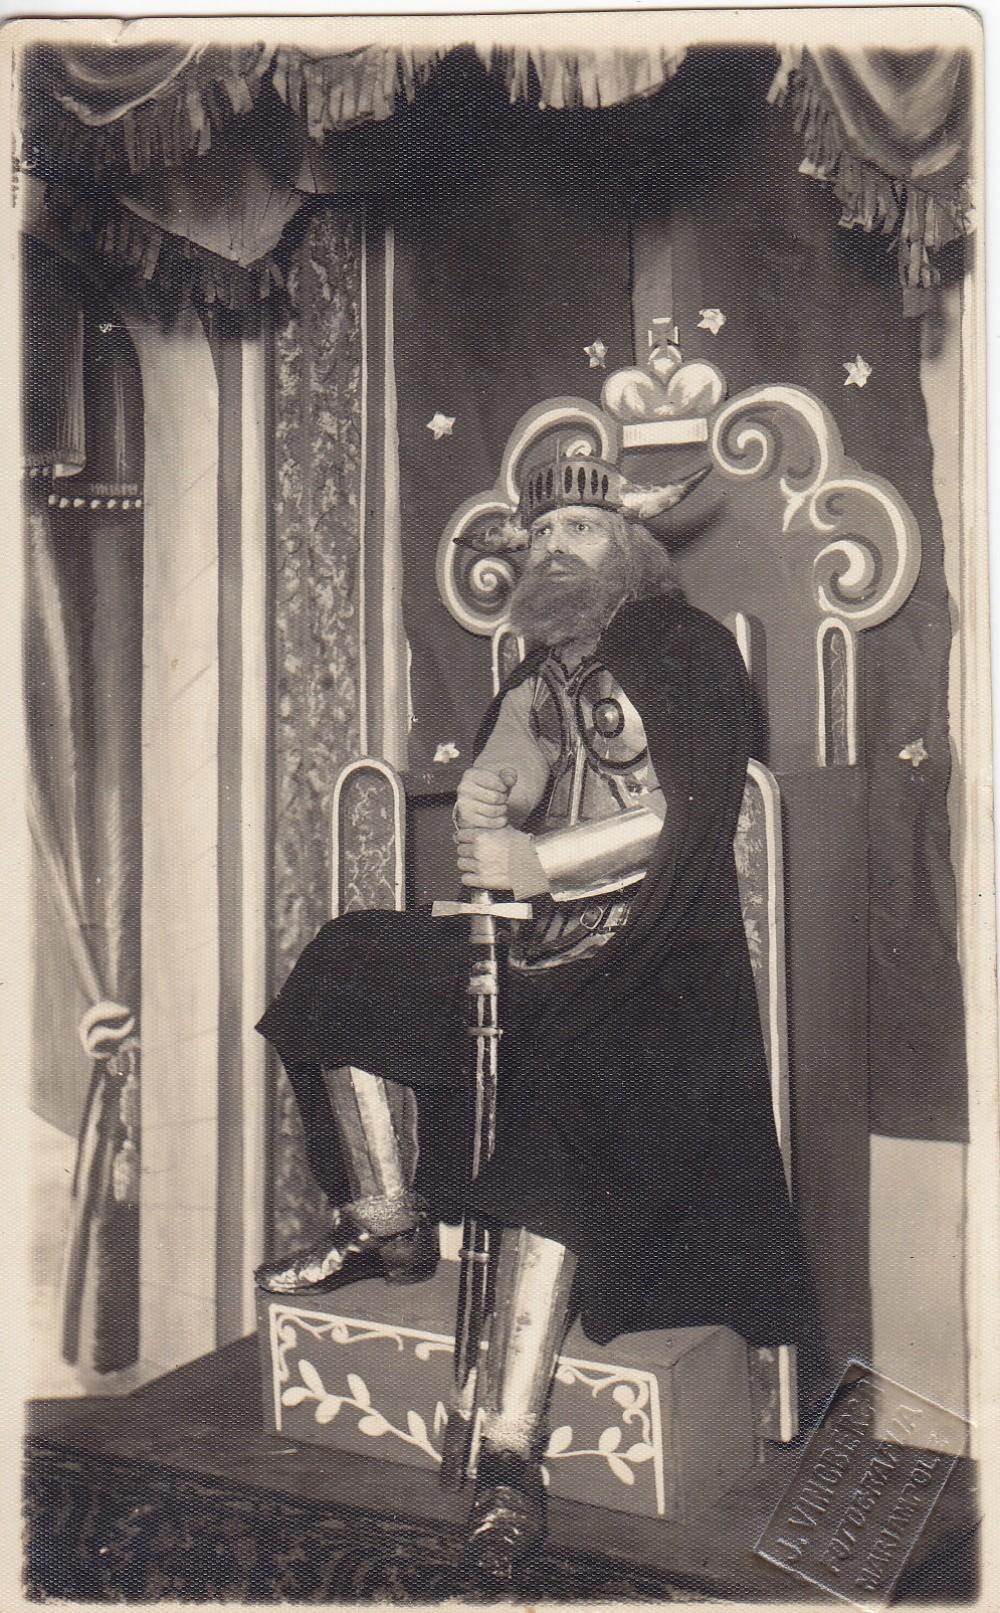 A. Gustaitis vaidina Kęstutį. Marijampolė. Apie 1926 m.